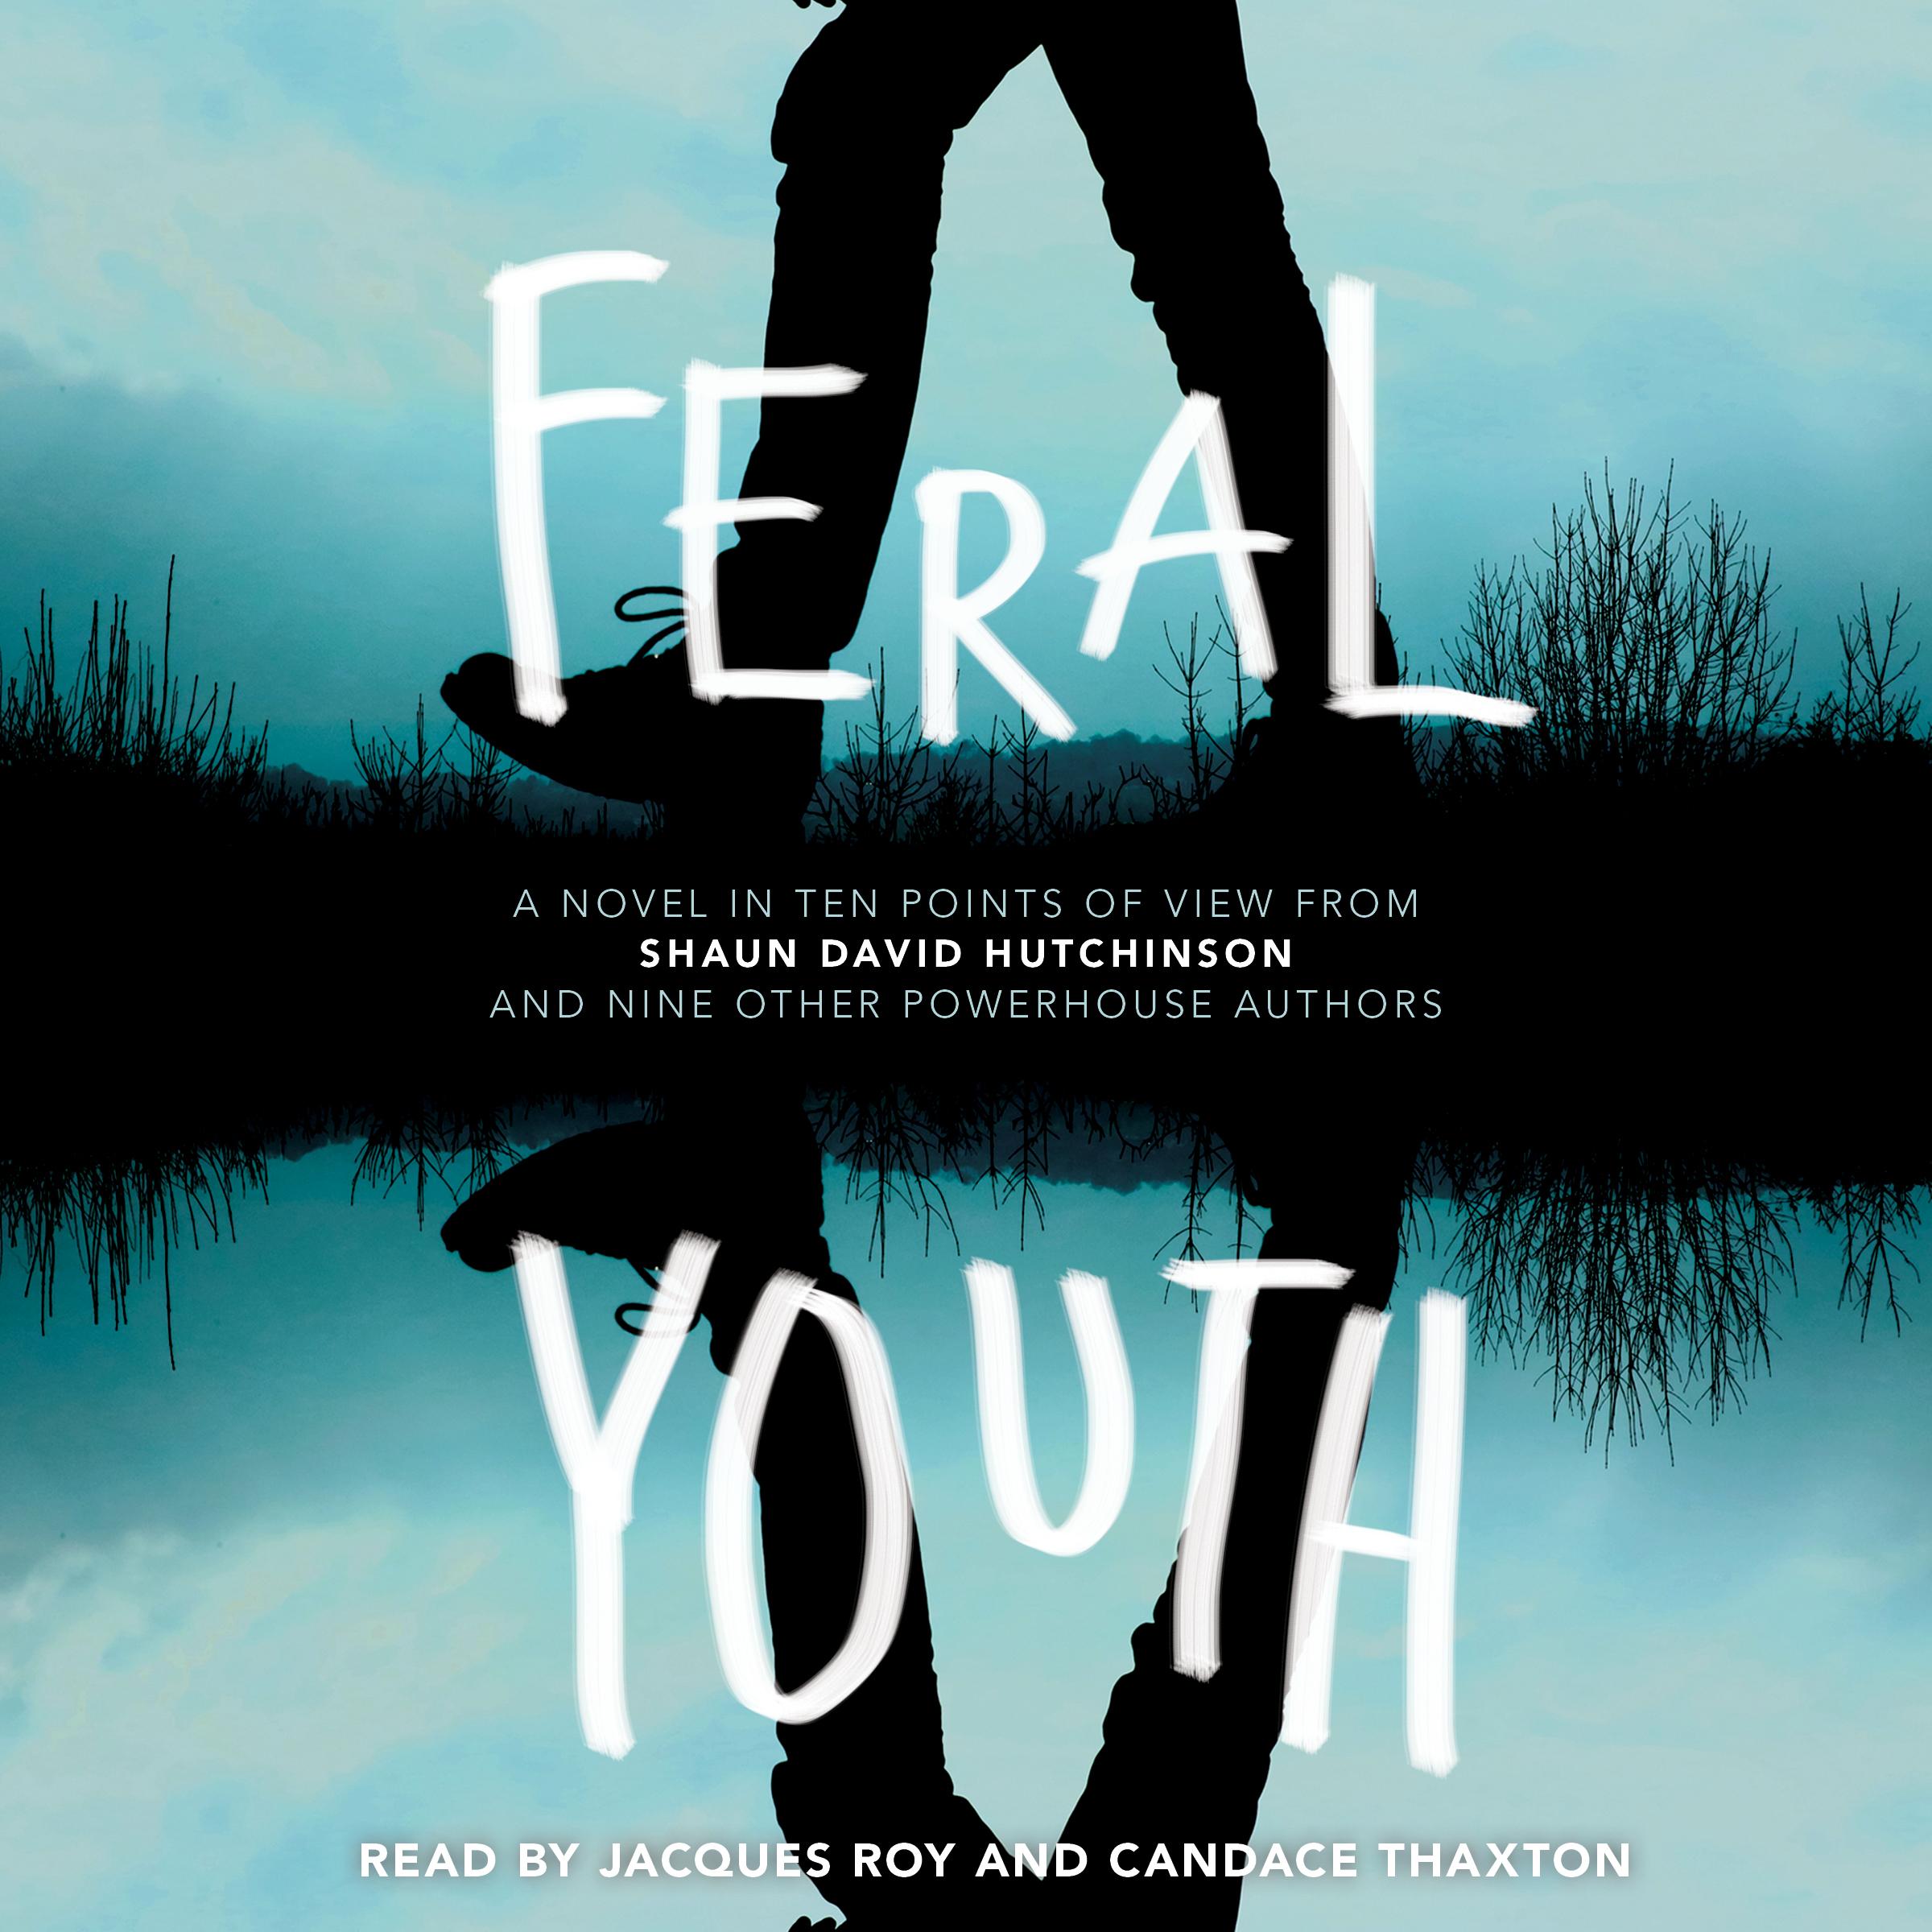 Feral youth 9781508243885 hr